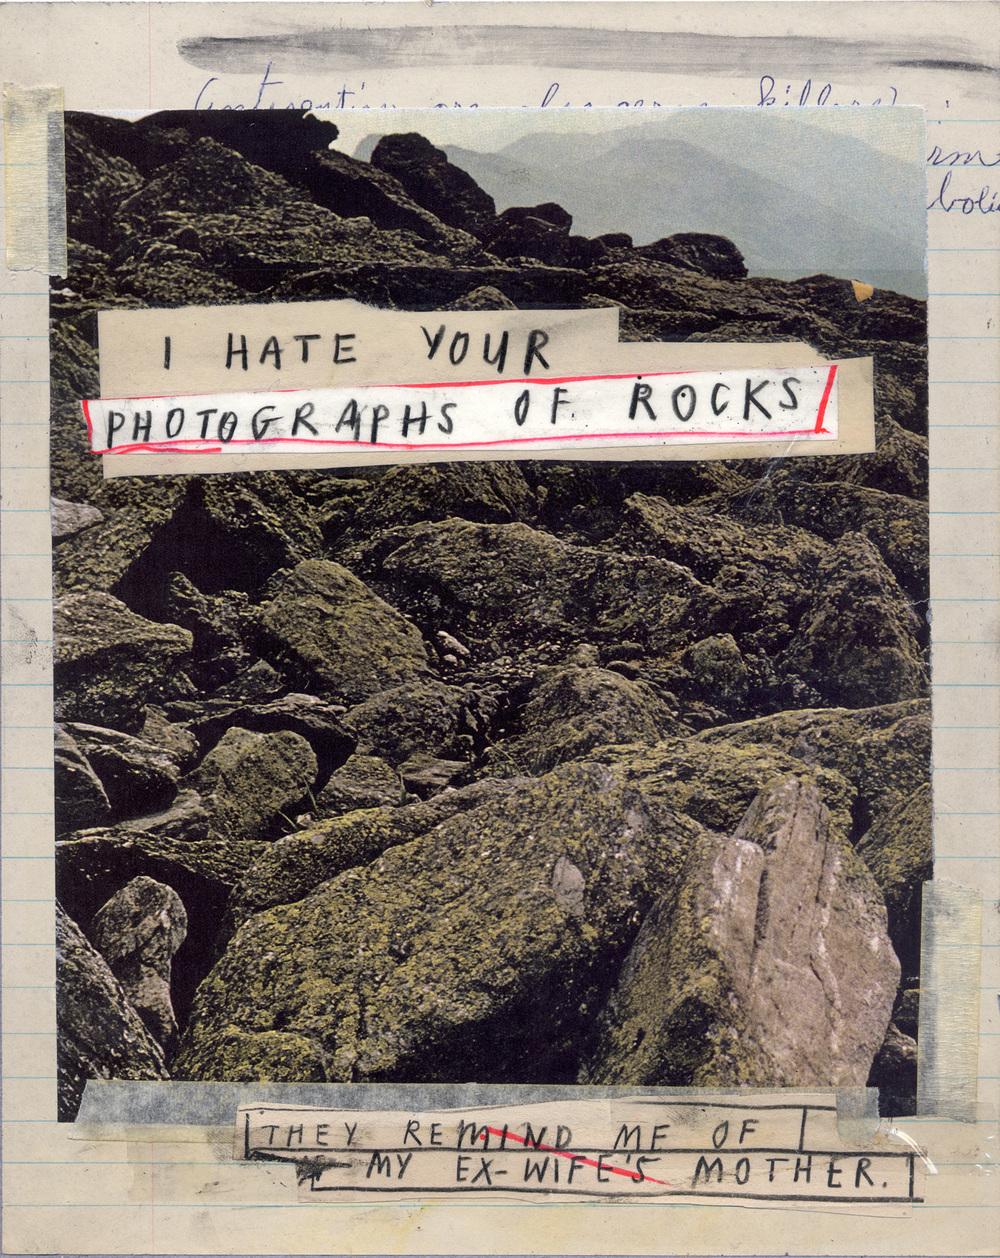 Rock_photo_lo.jpg